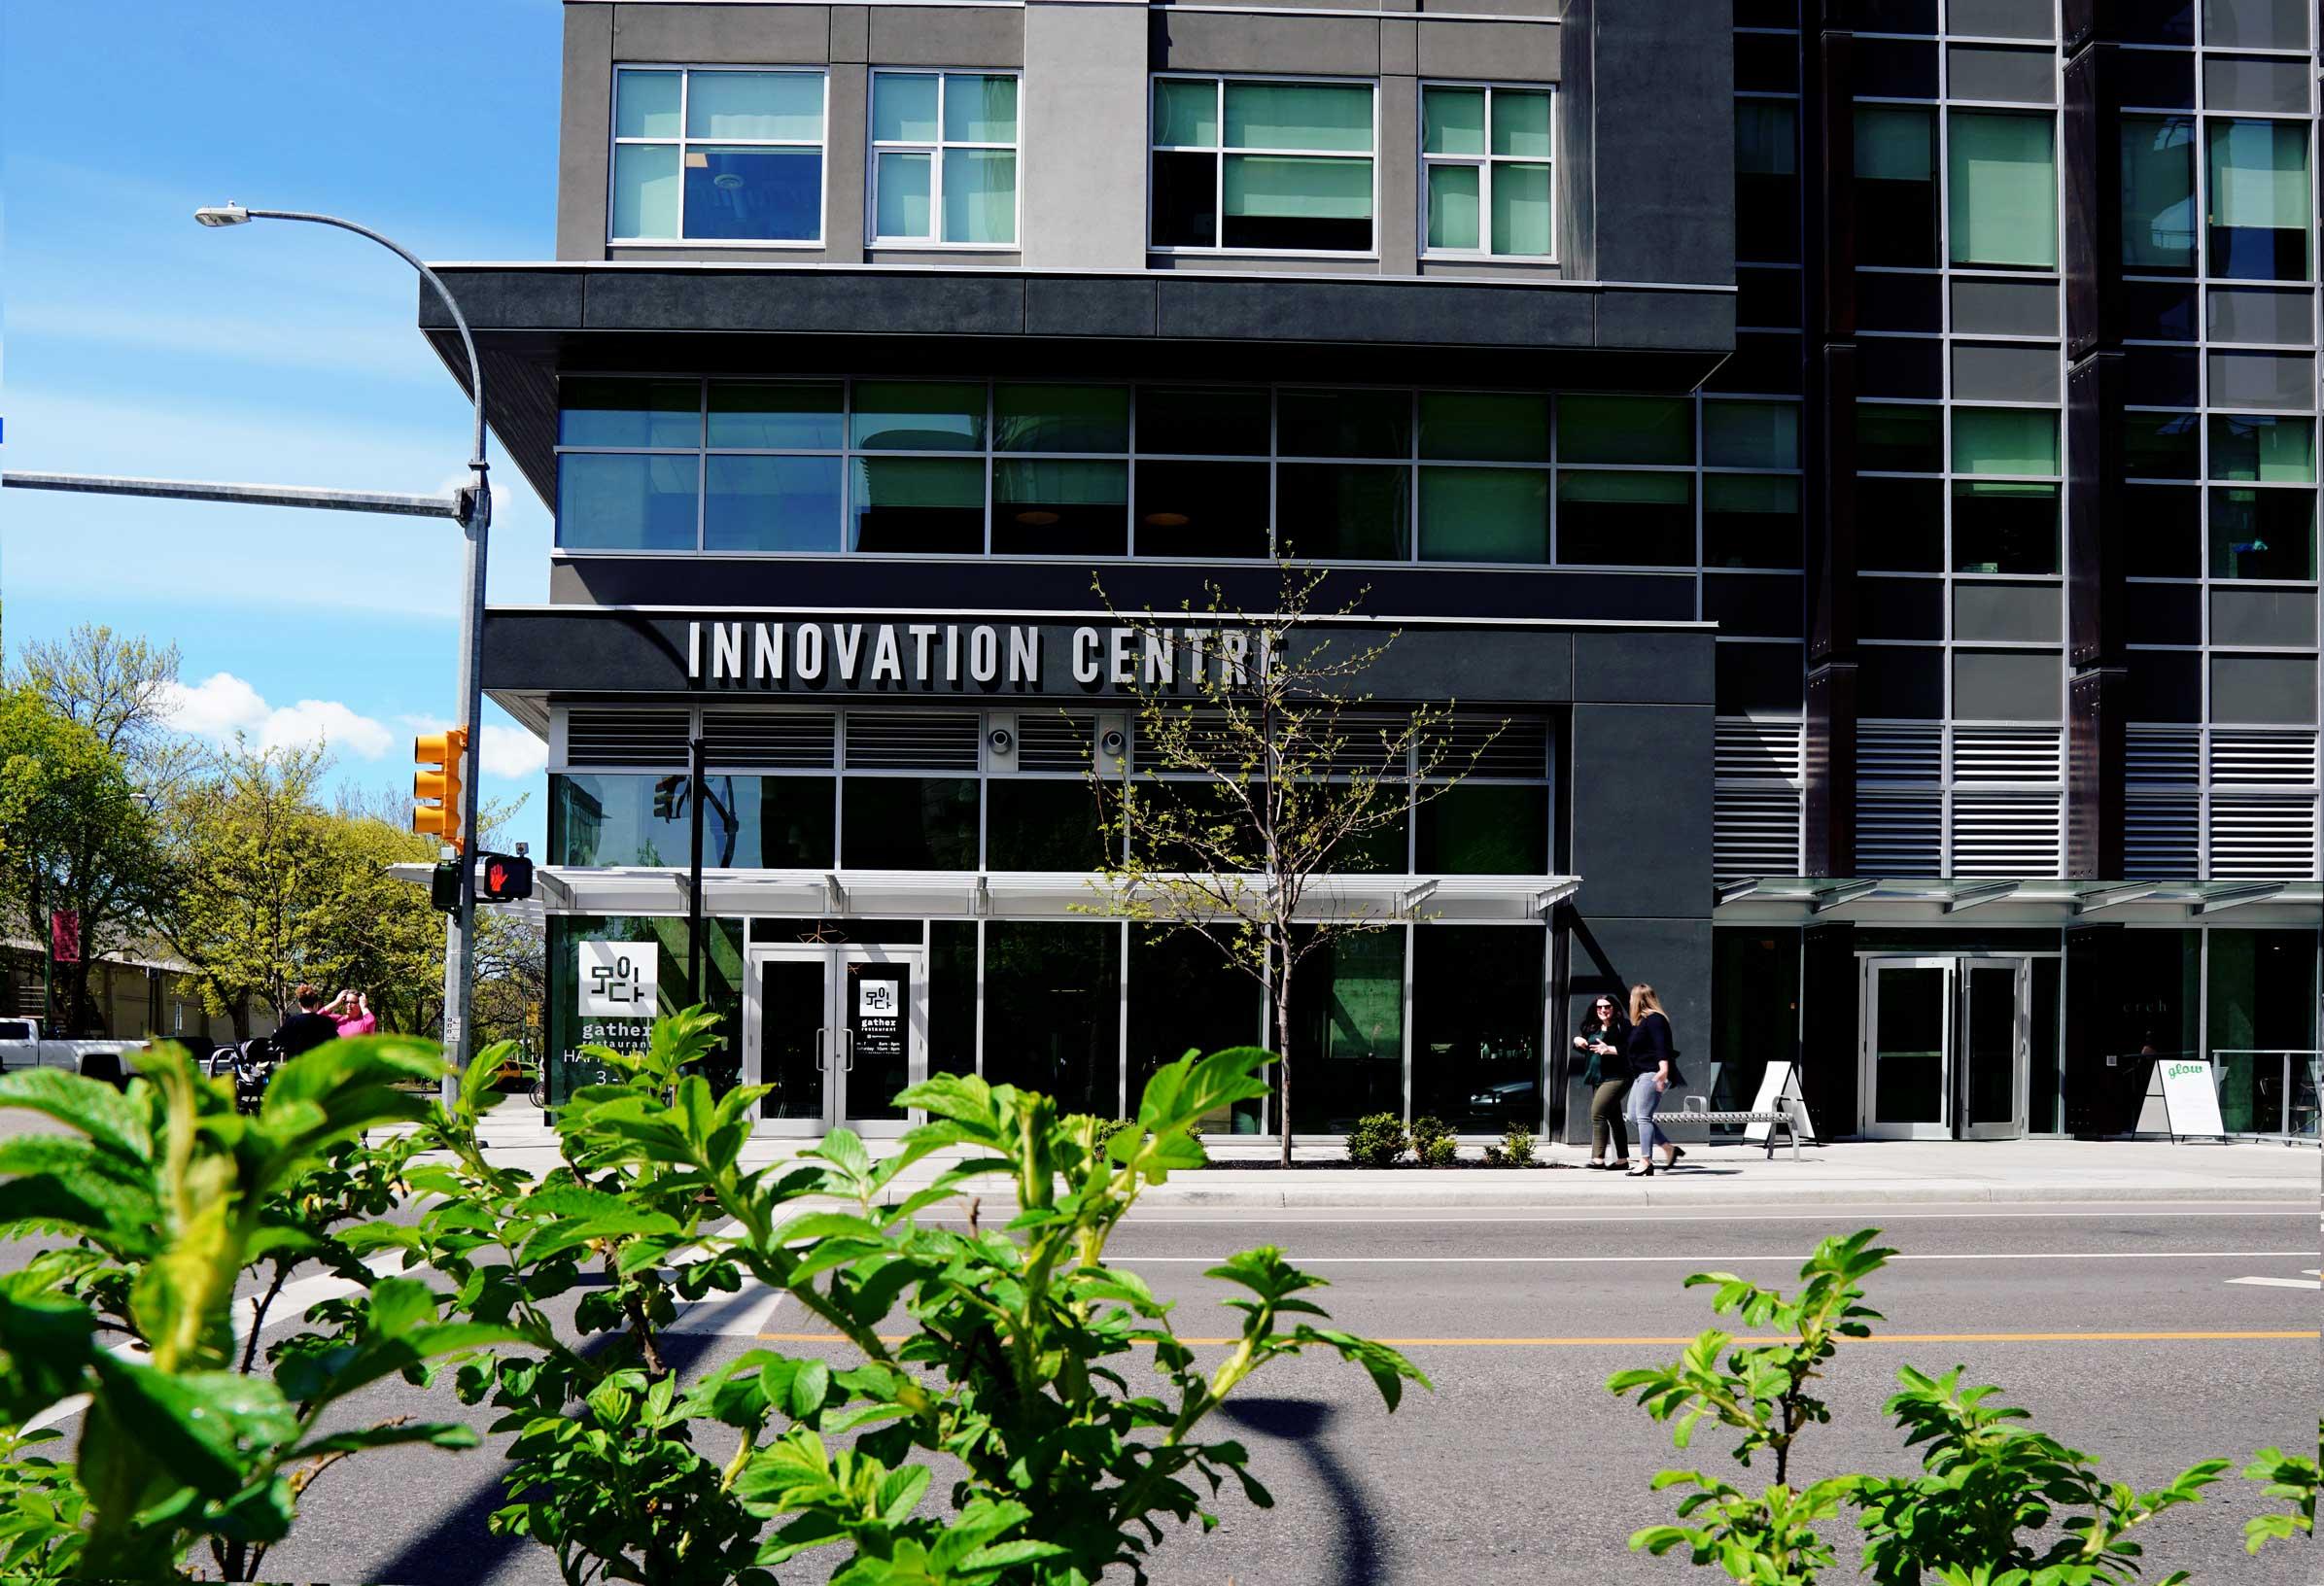 Kelowna Innovation Centre Building, Home of Twirling Umbrellas Digital Marketing Agency